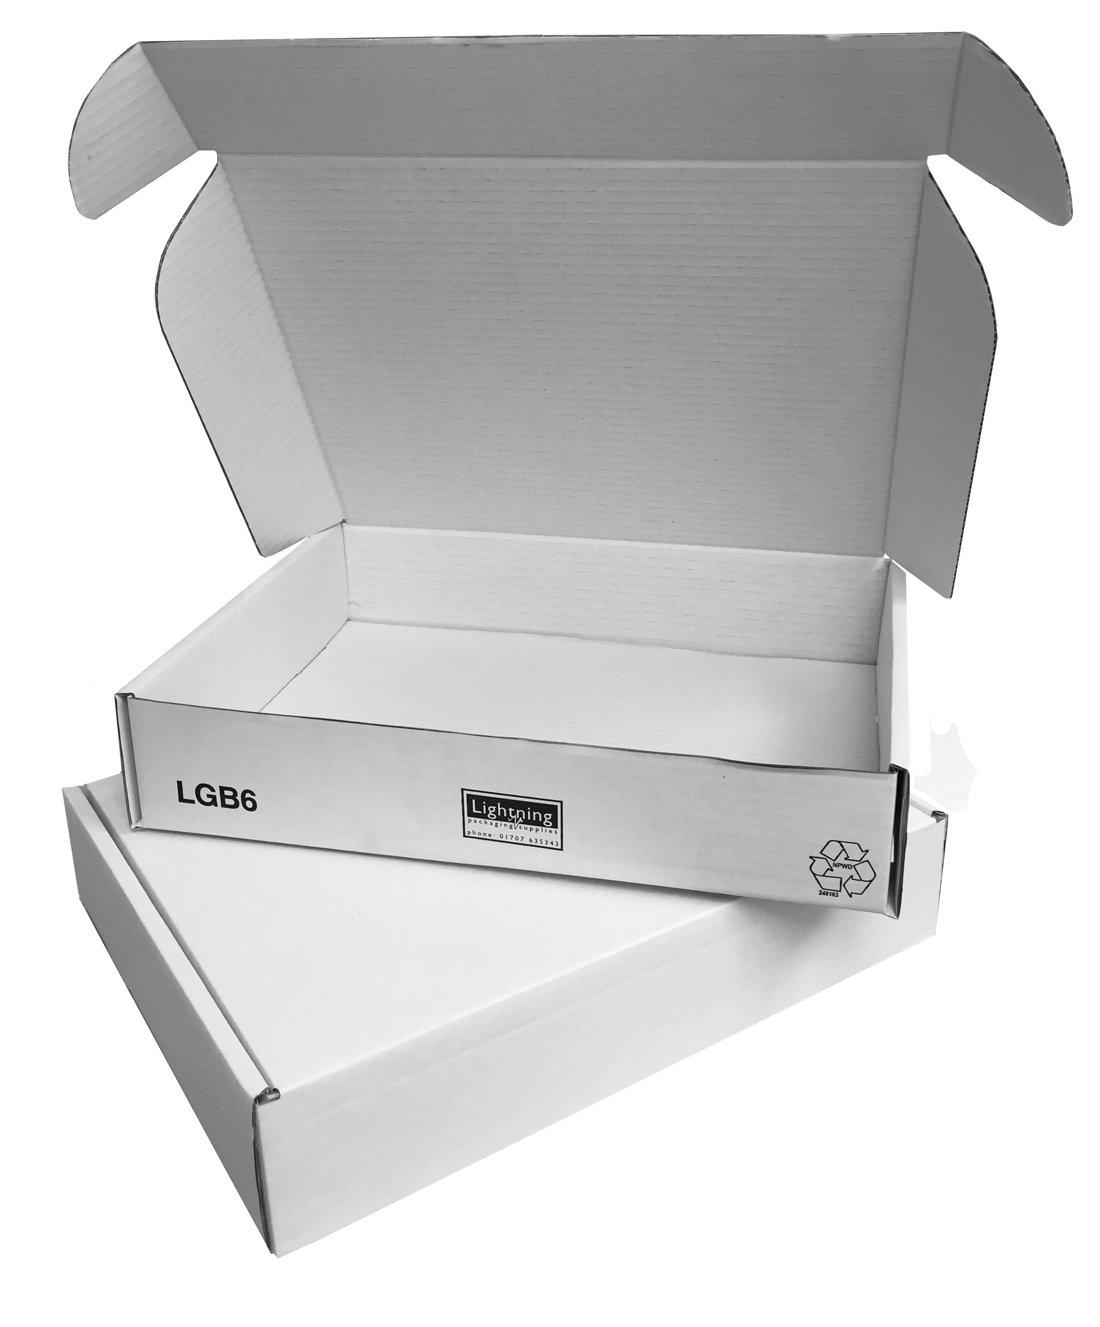 Cajas para envío por correo de color blanco, 360 x 280 x 72 mmPaquete de 25 unidades.Caja lisa plana resistente de cartón tipo pizza, con solapas para ...